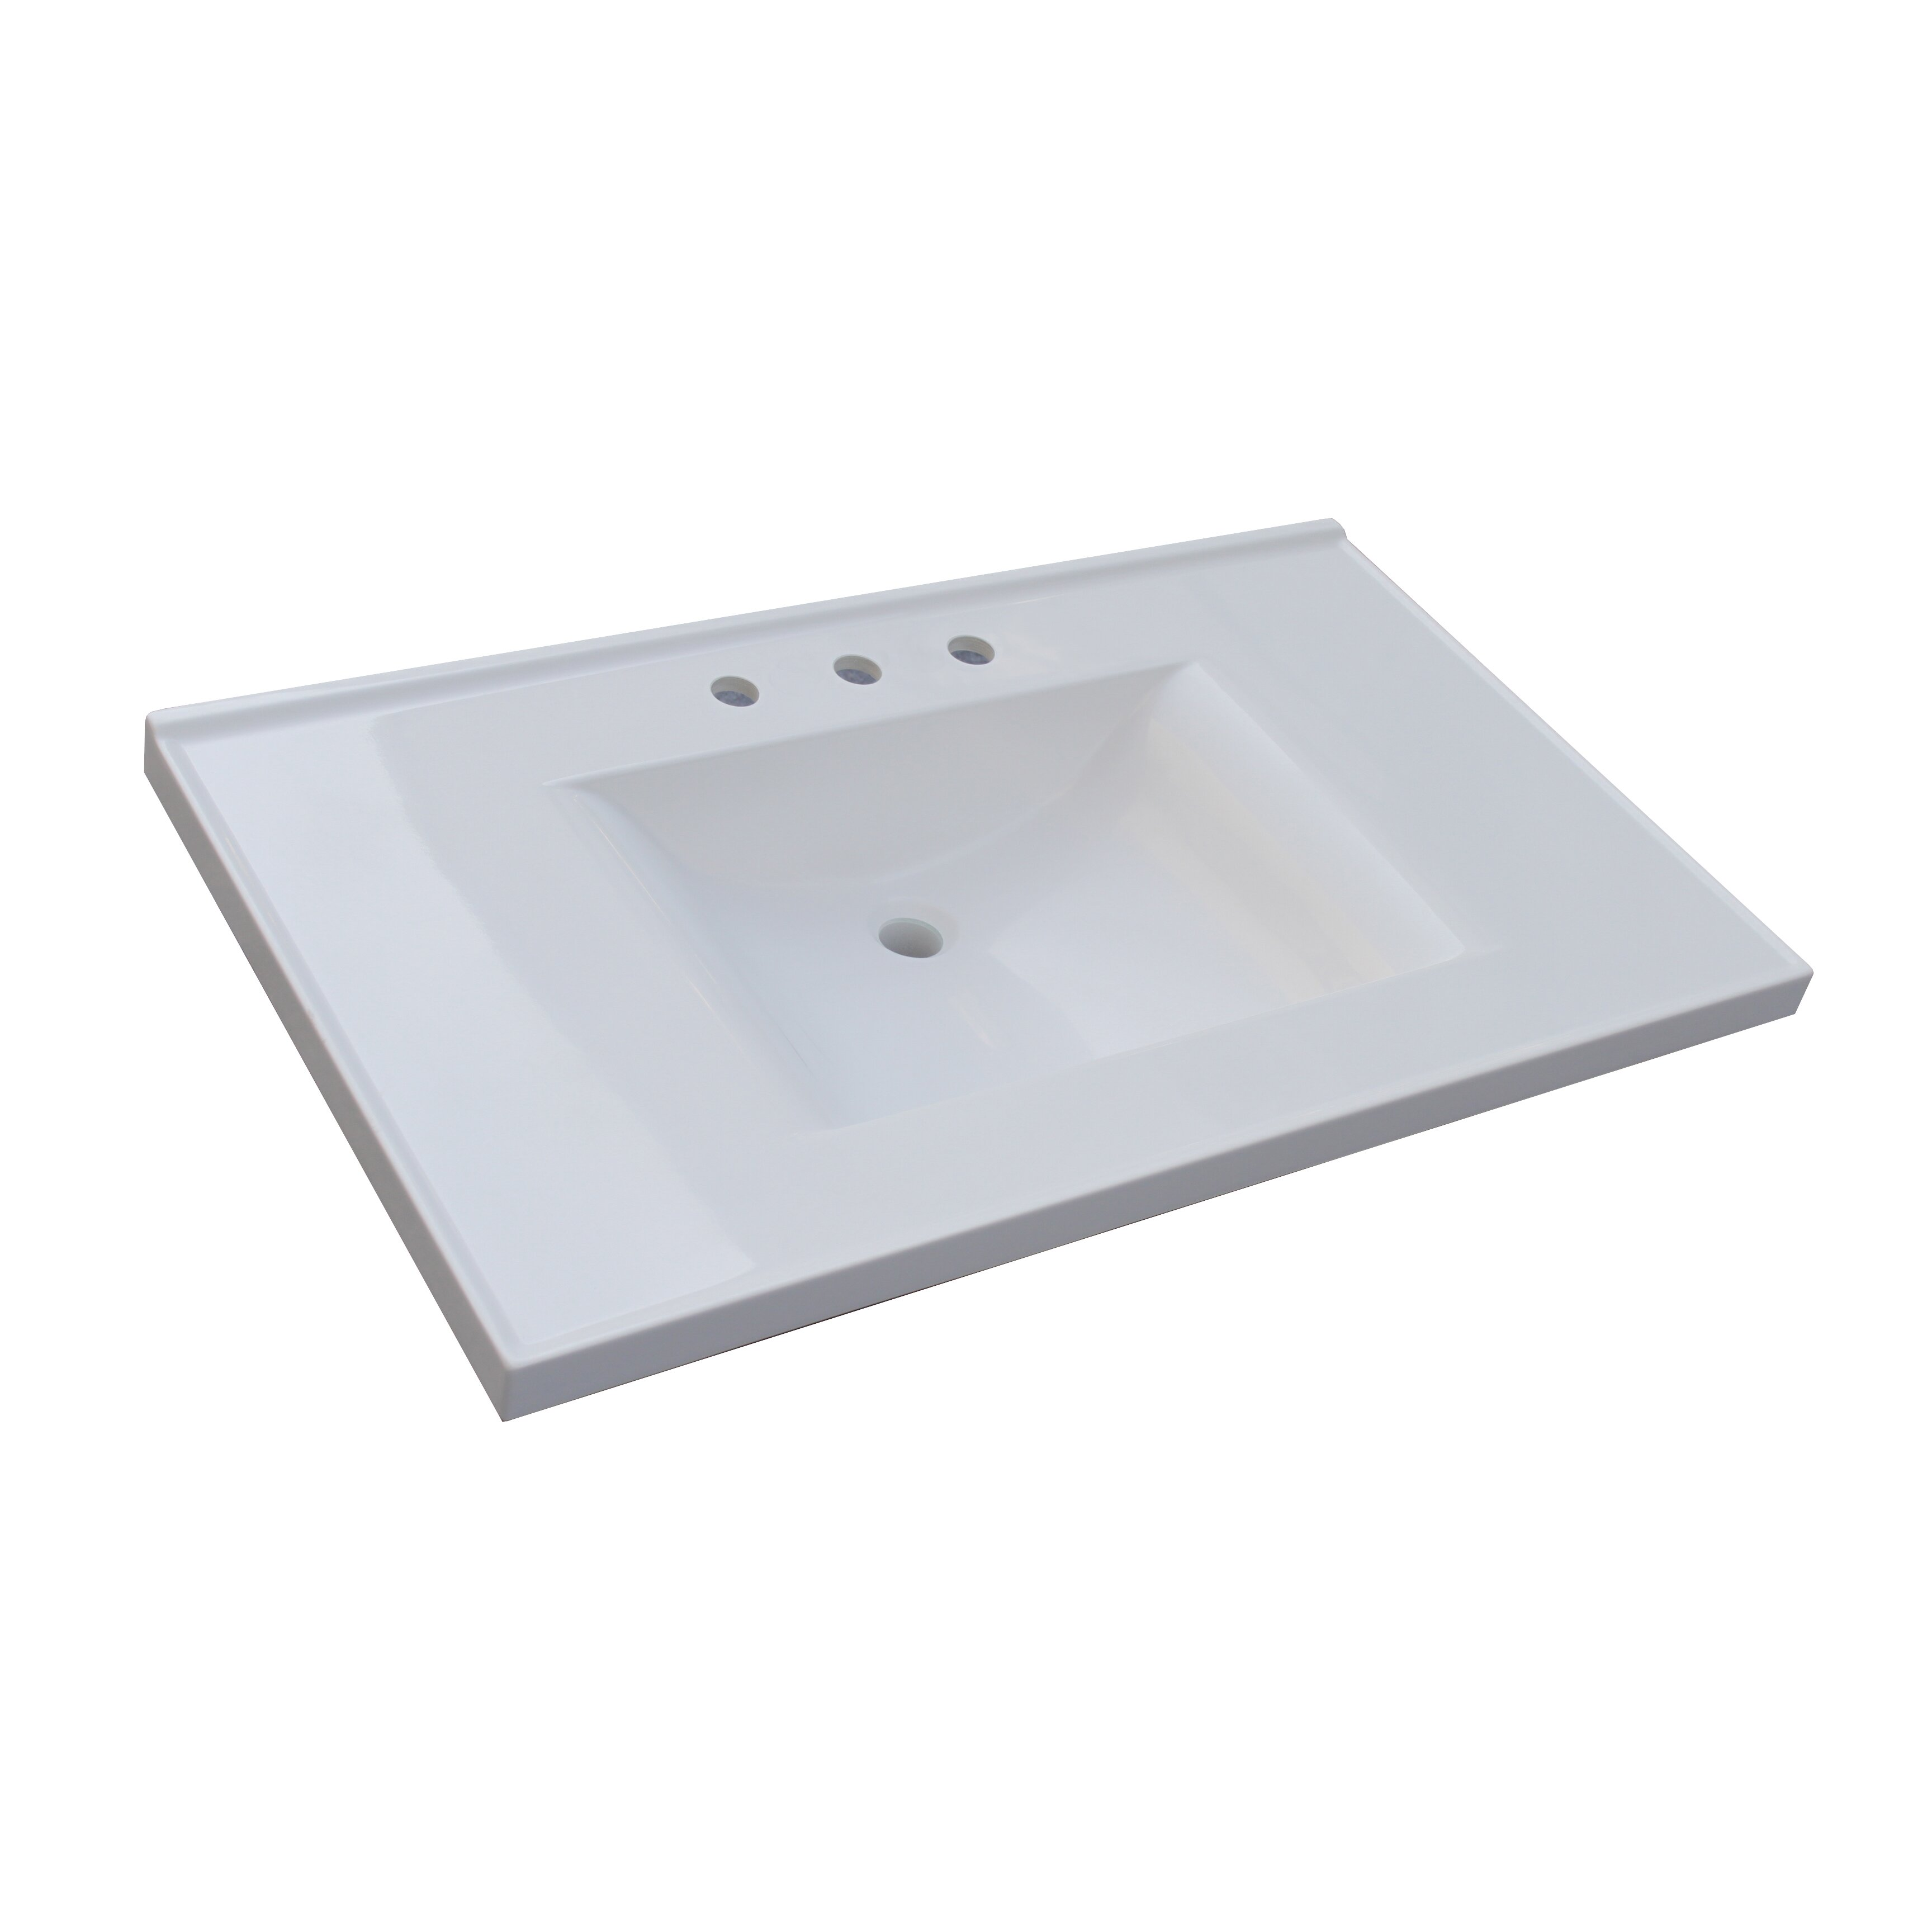 sunny wood premier tops 37 bathroom vanity top with. Black Bedroom Furniture Sets. Home Design Ideas